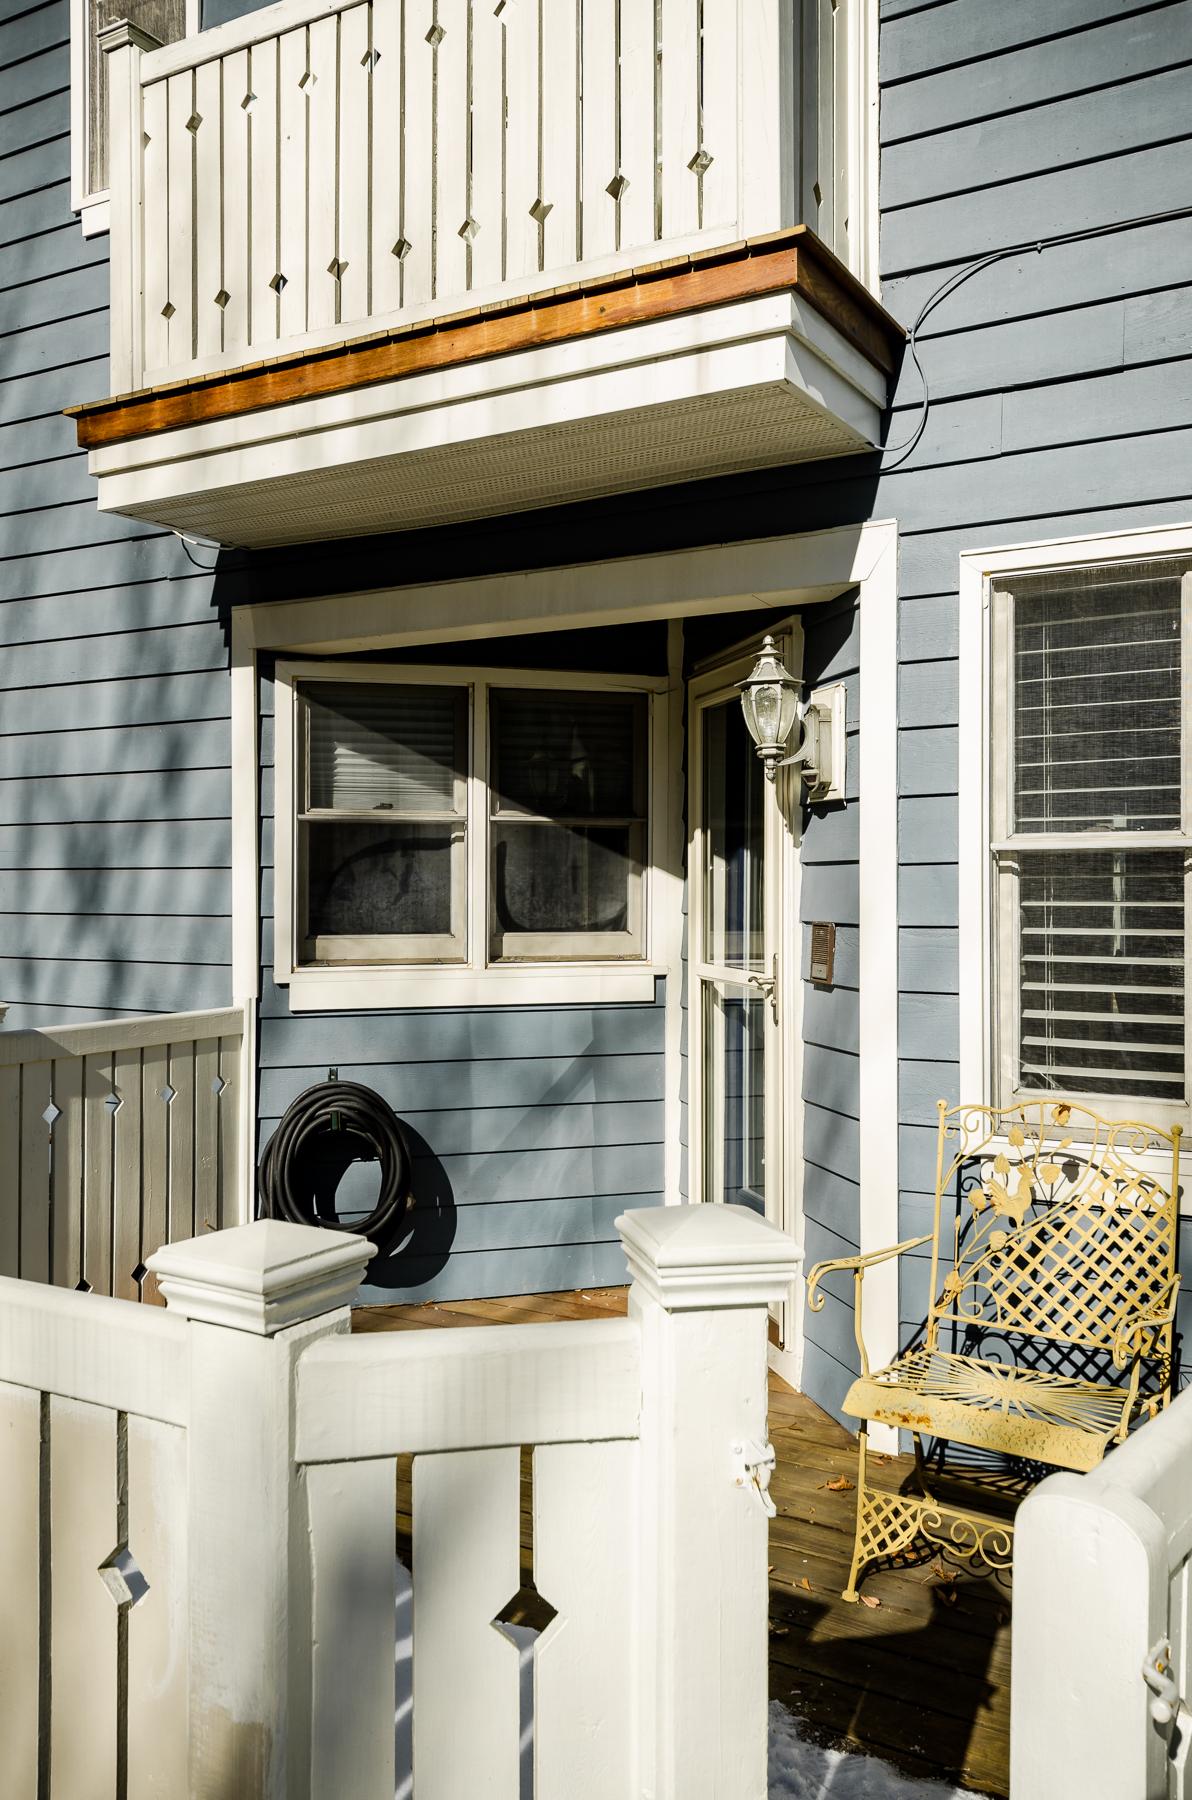 Additional photo for property listing at Simply Sensational 3 Raritan Pointe Lambertville, Нью-Джерси 08530 Соединенные Штаты